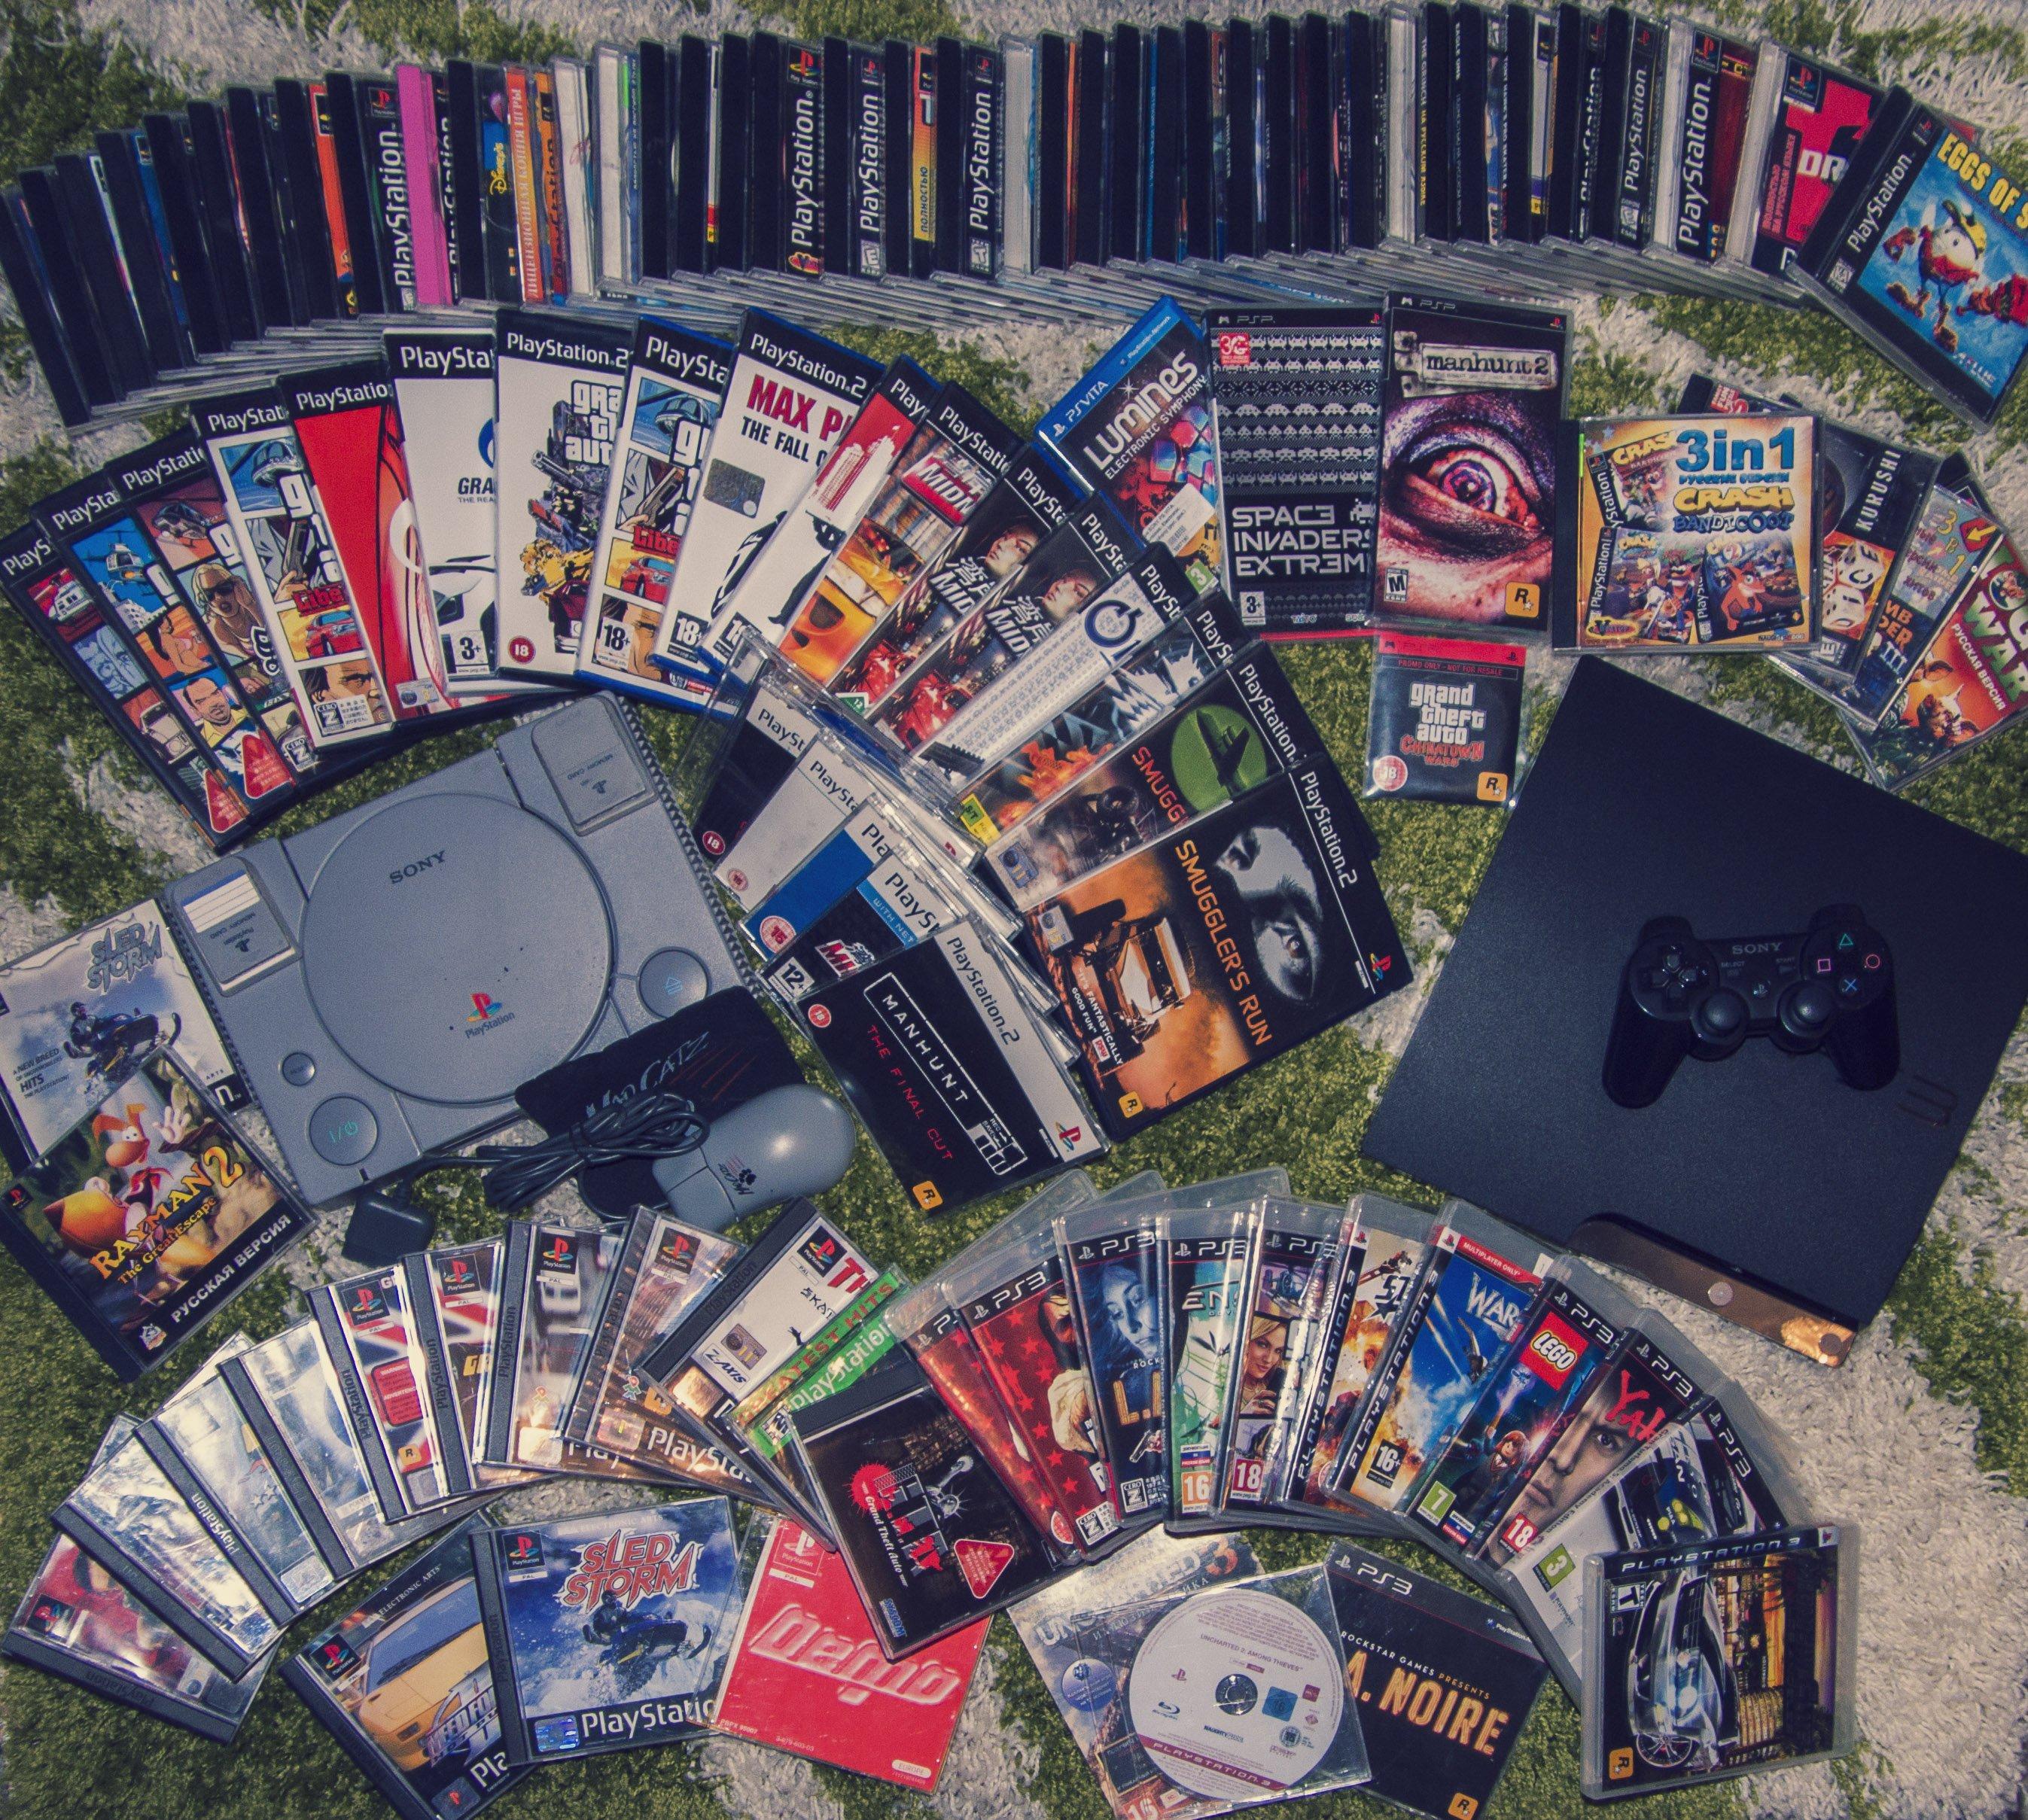 Playstation для ребенка, Playstation 3 для юноши. - Изображение 2